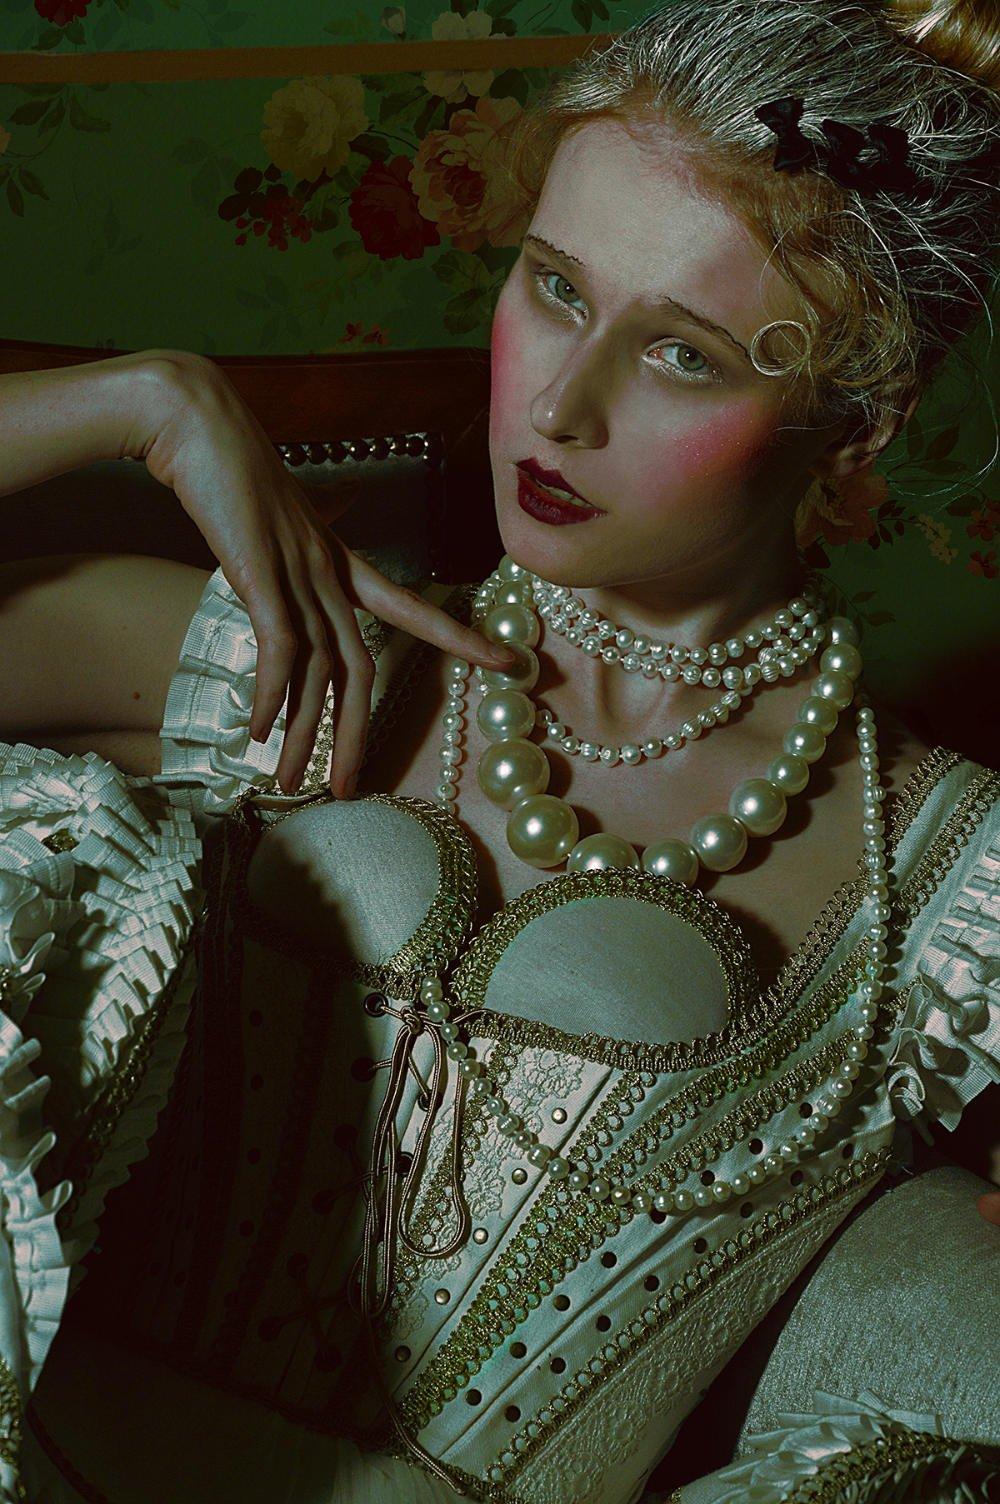 The-Forest-Magazine-Arman-Livanov-02